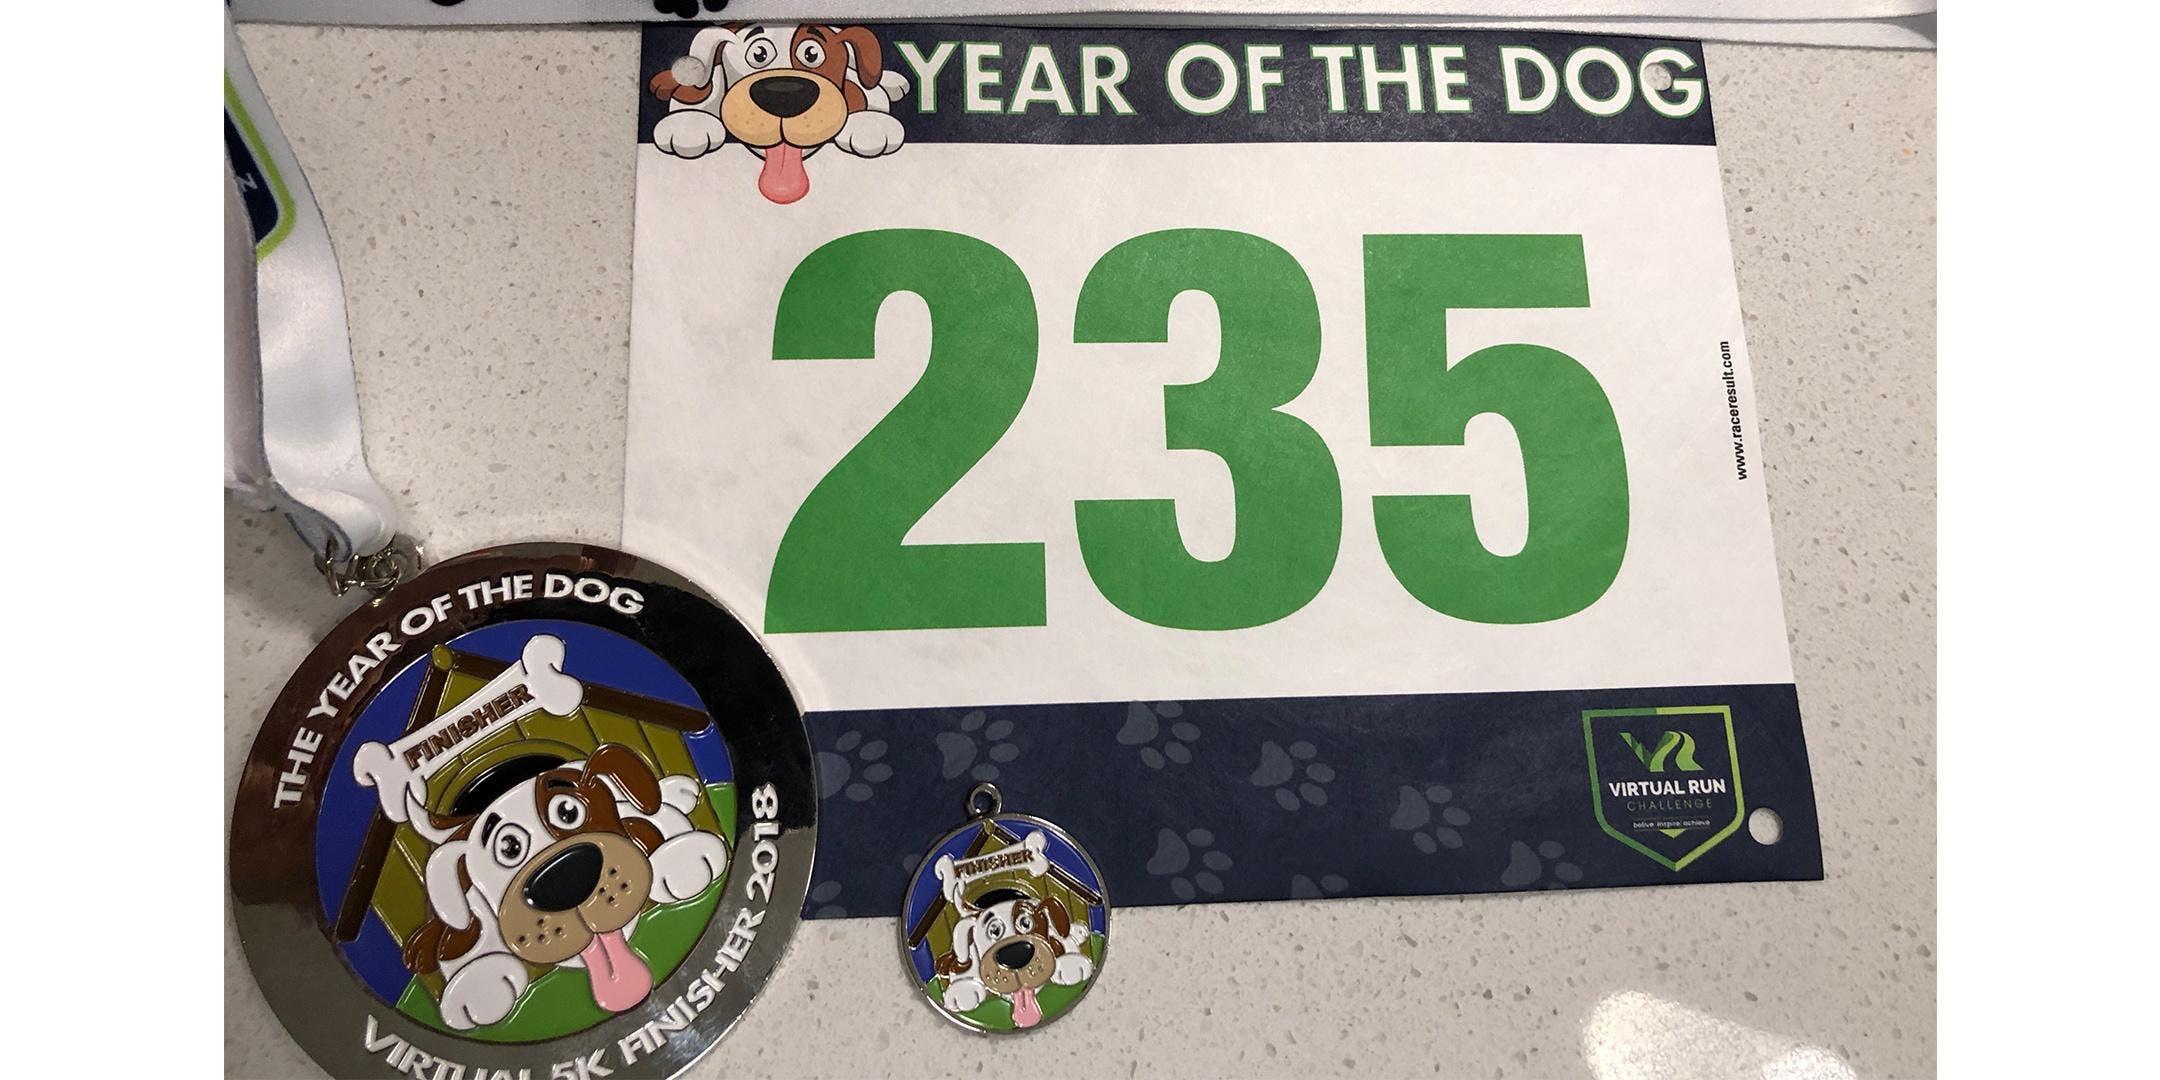 2018 Year of the Dog Virtual 5k Run/Walk - Scottsdale